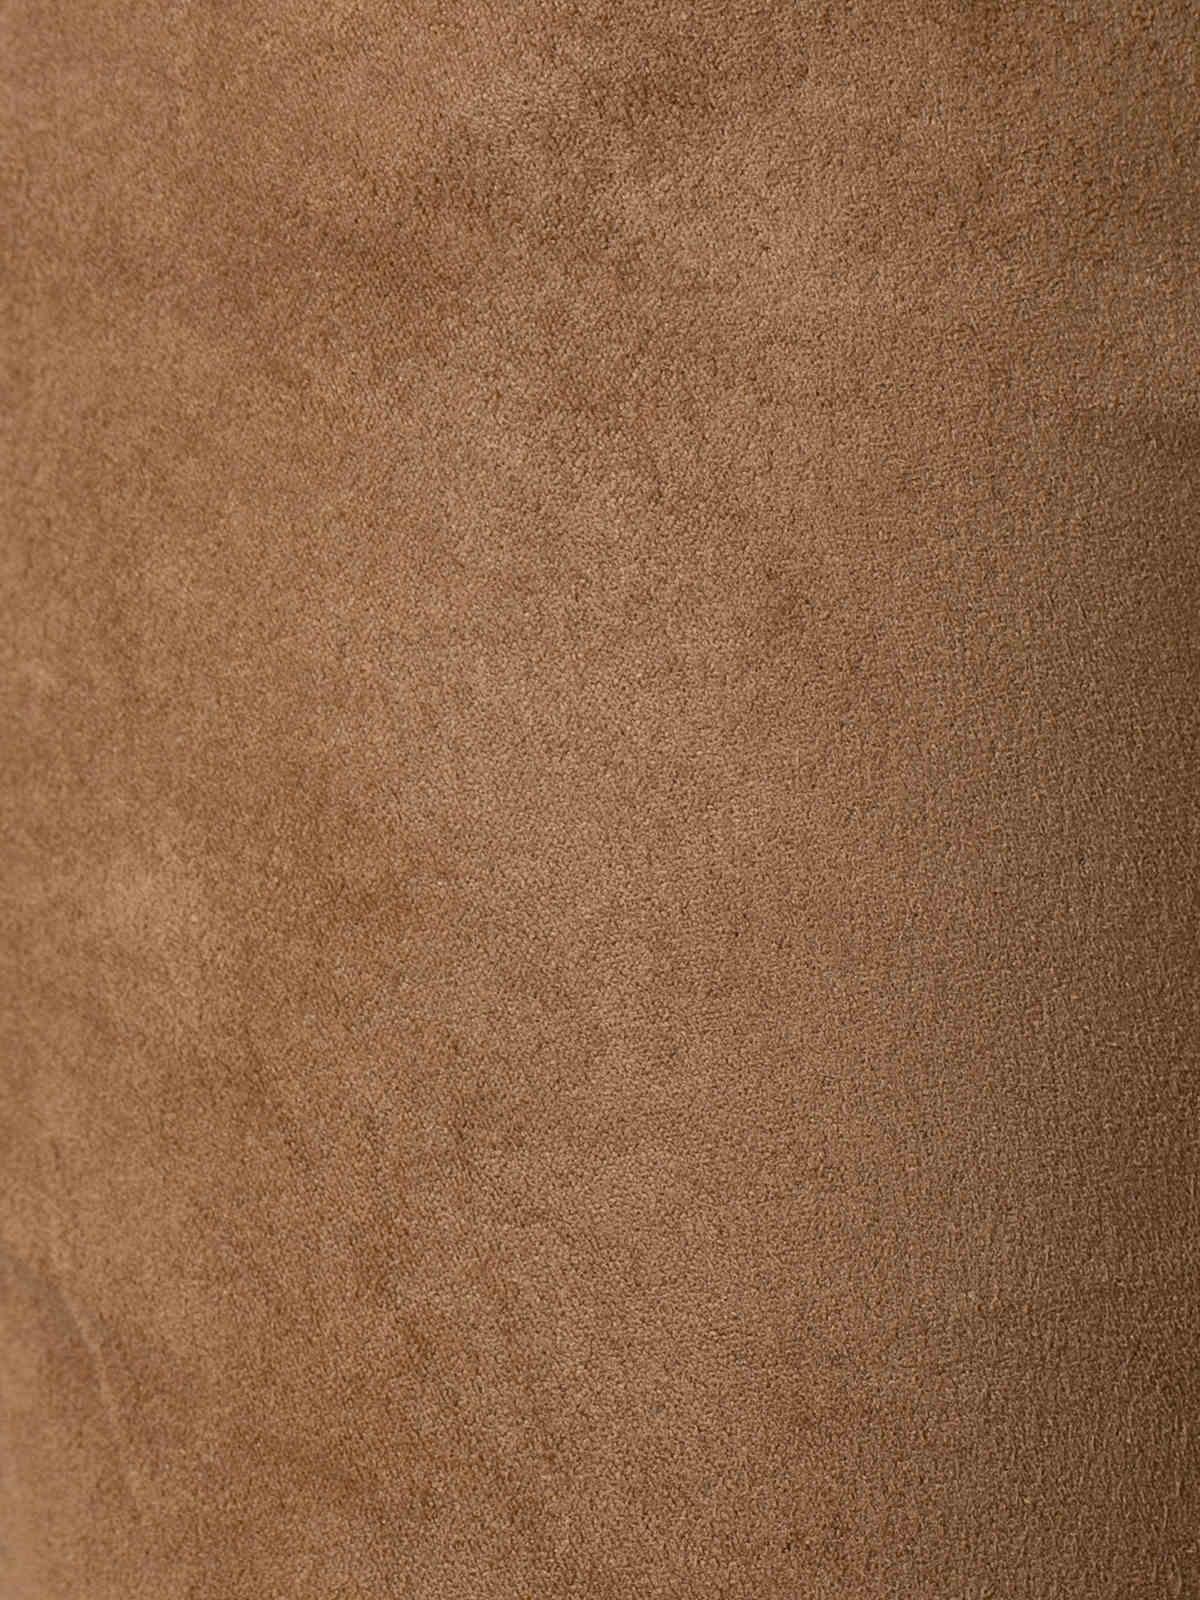 Pantalón mujer sport goma tinte ecológico Camel